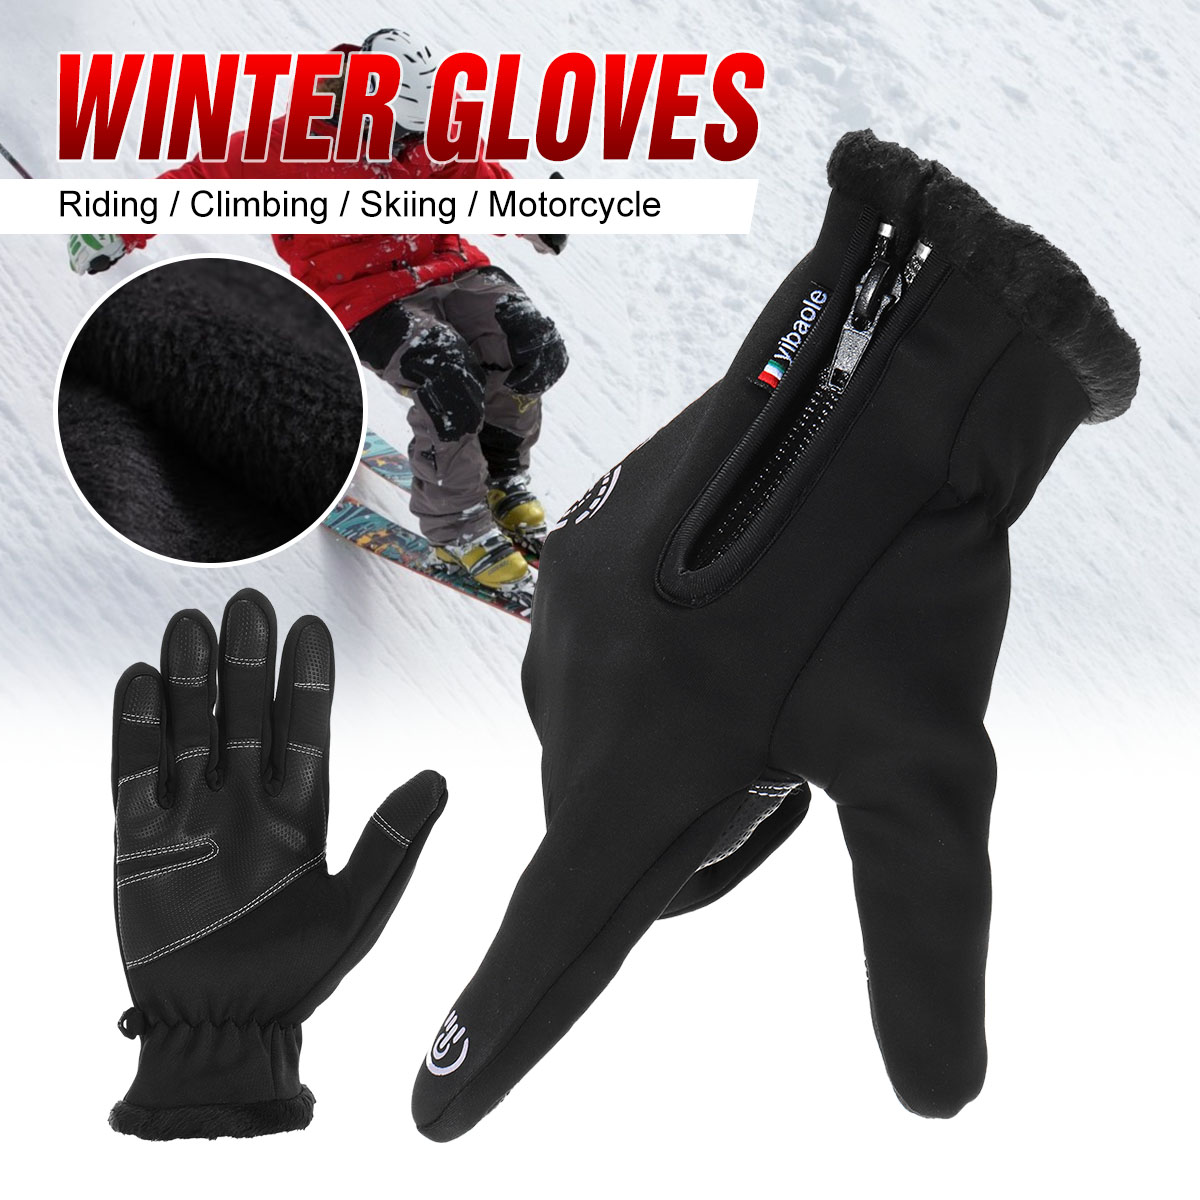 Ski Gloves Waterproof Fleece Thermal Heated Gloves Snowboard Snowmobile Gloves Men Women Winter Gloves For Sonwboarding